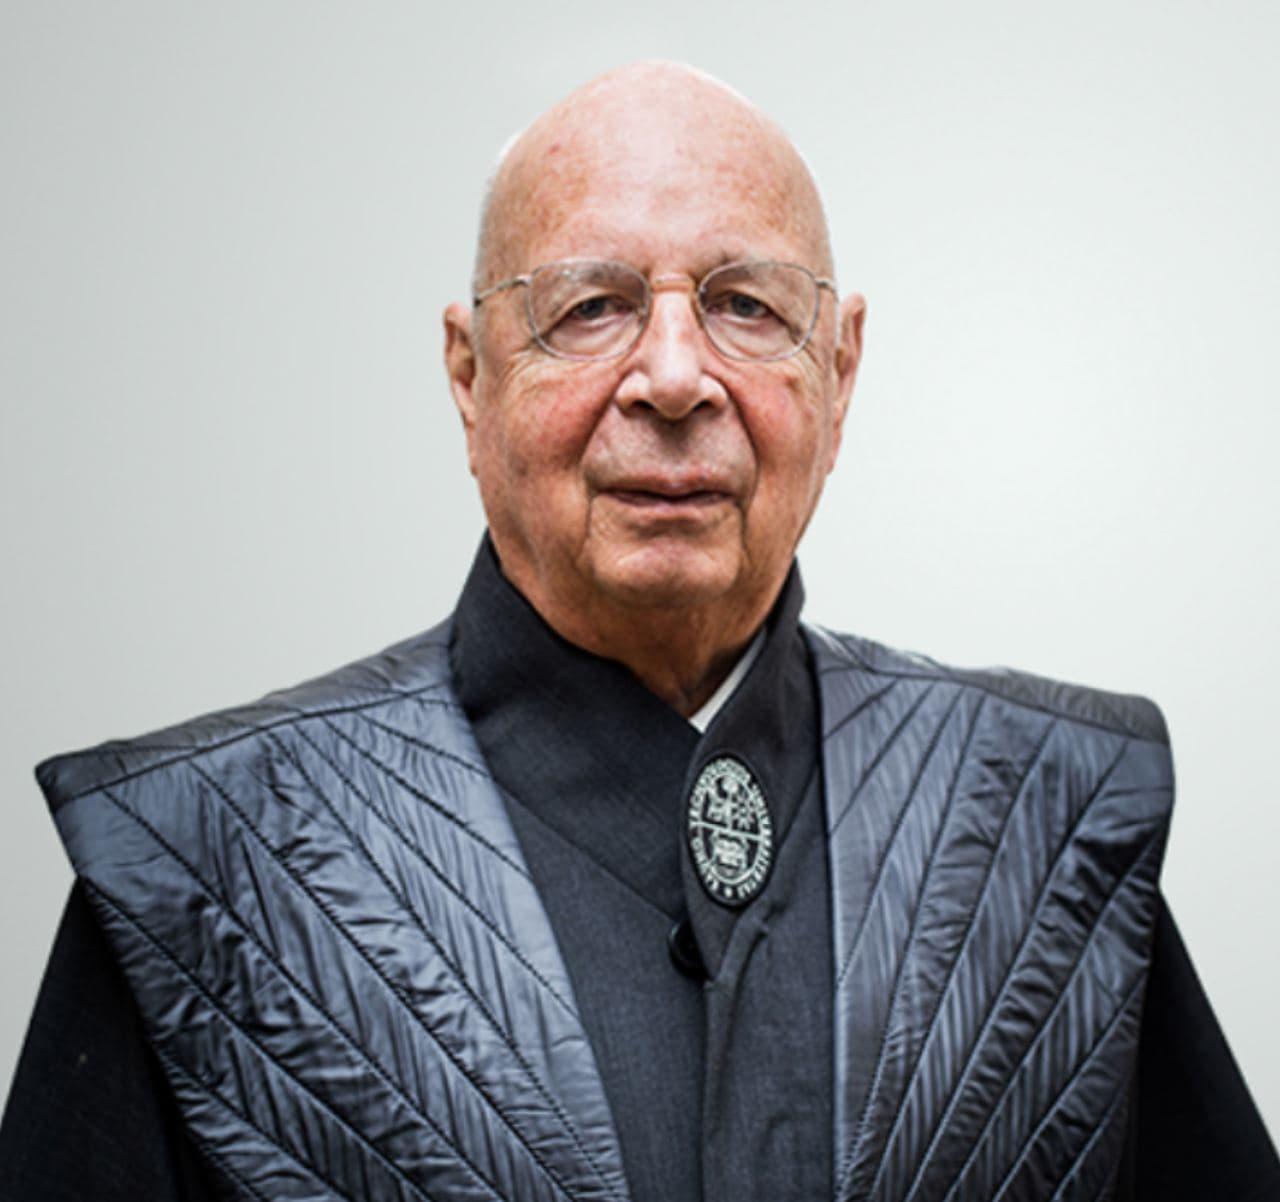 Klaus Schwab